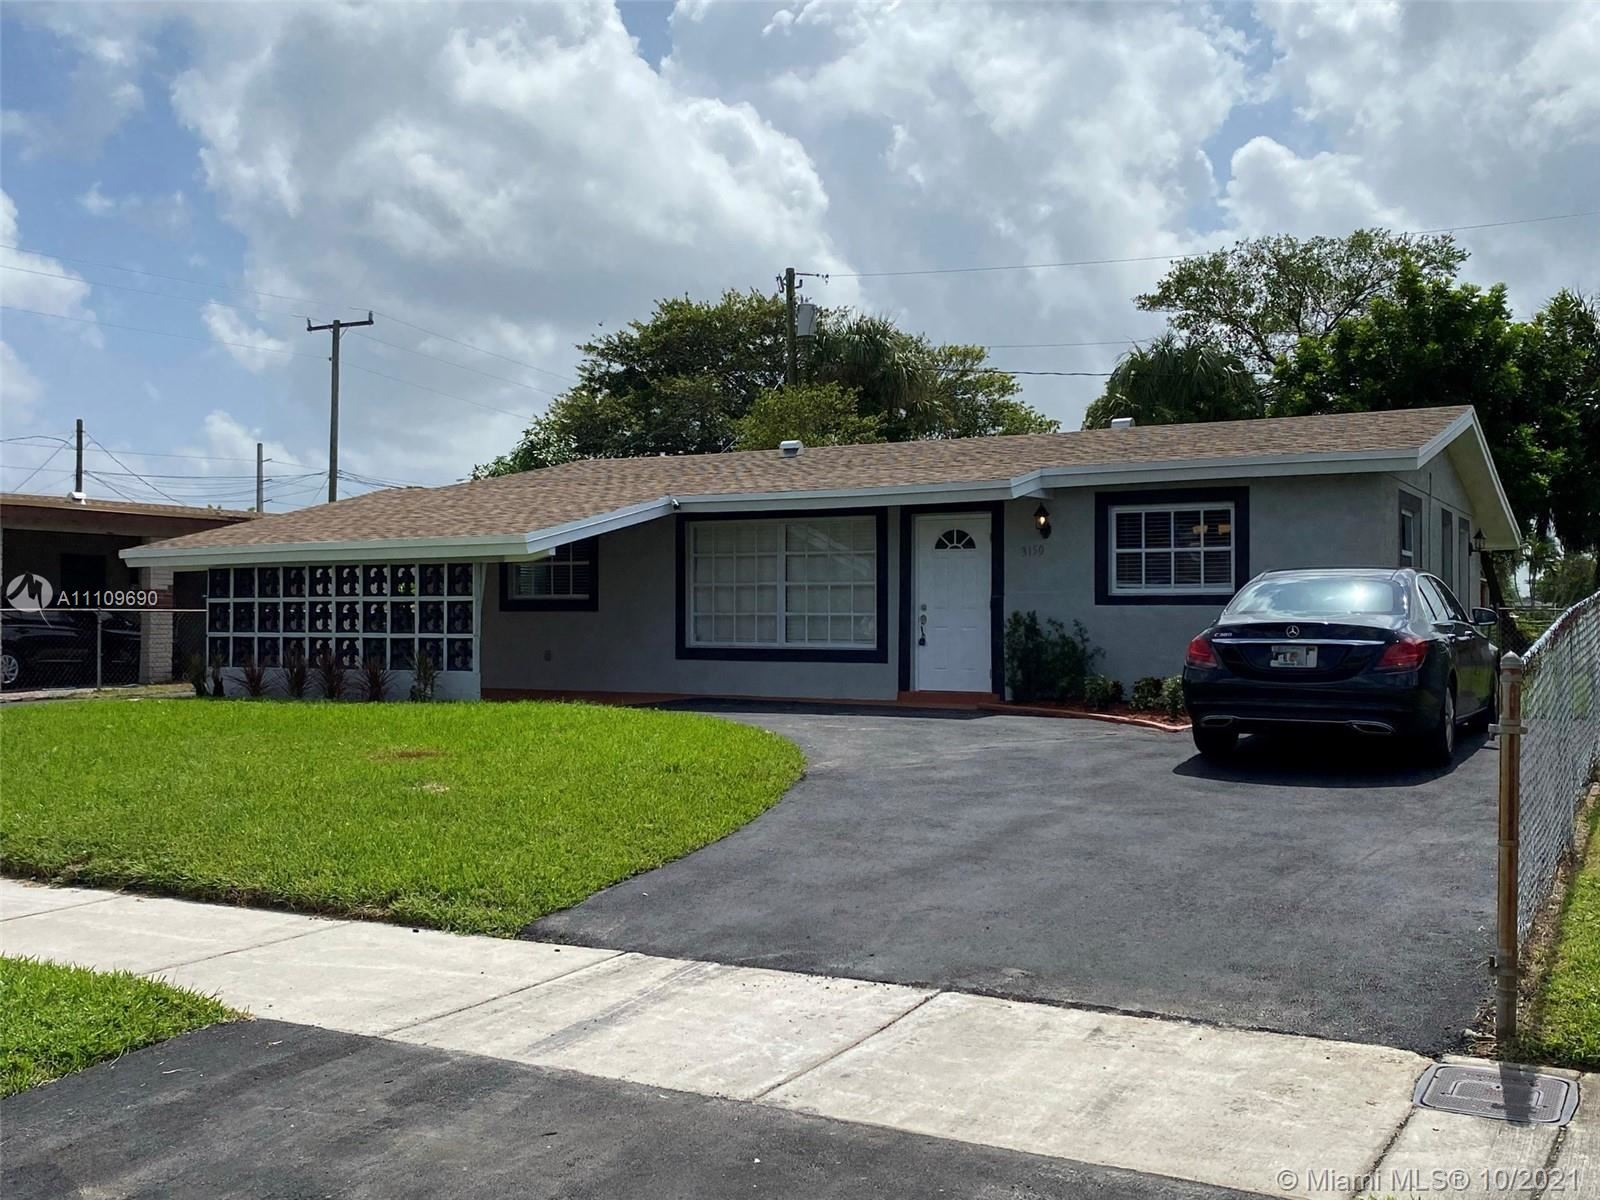 Photo of 3150 NW 14th St, Lauderhill, FL 33311 (MLS # A11109690)